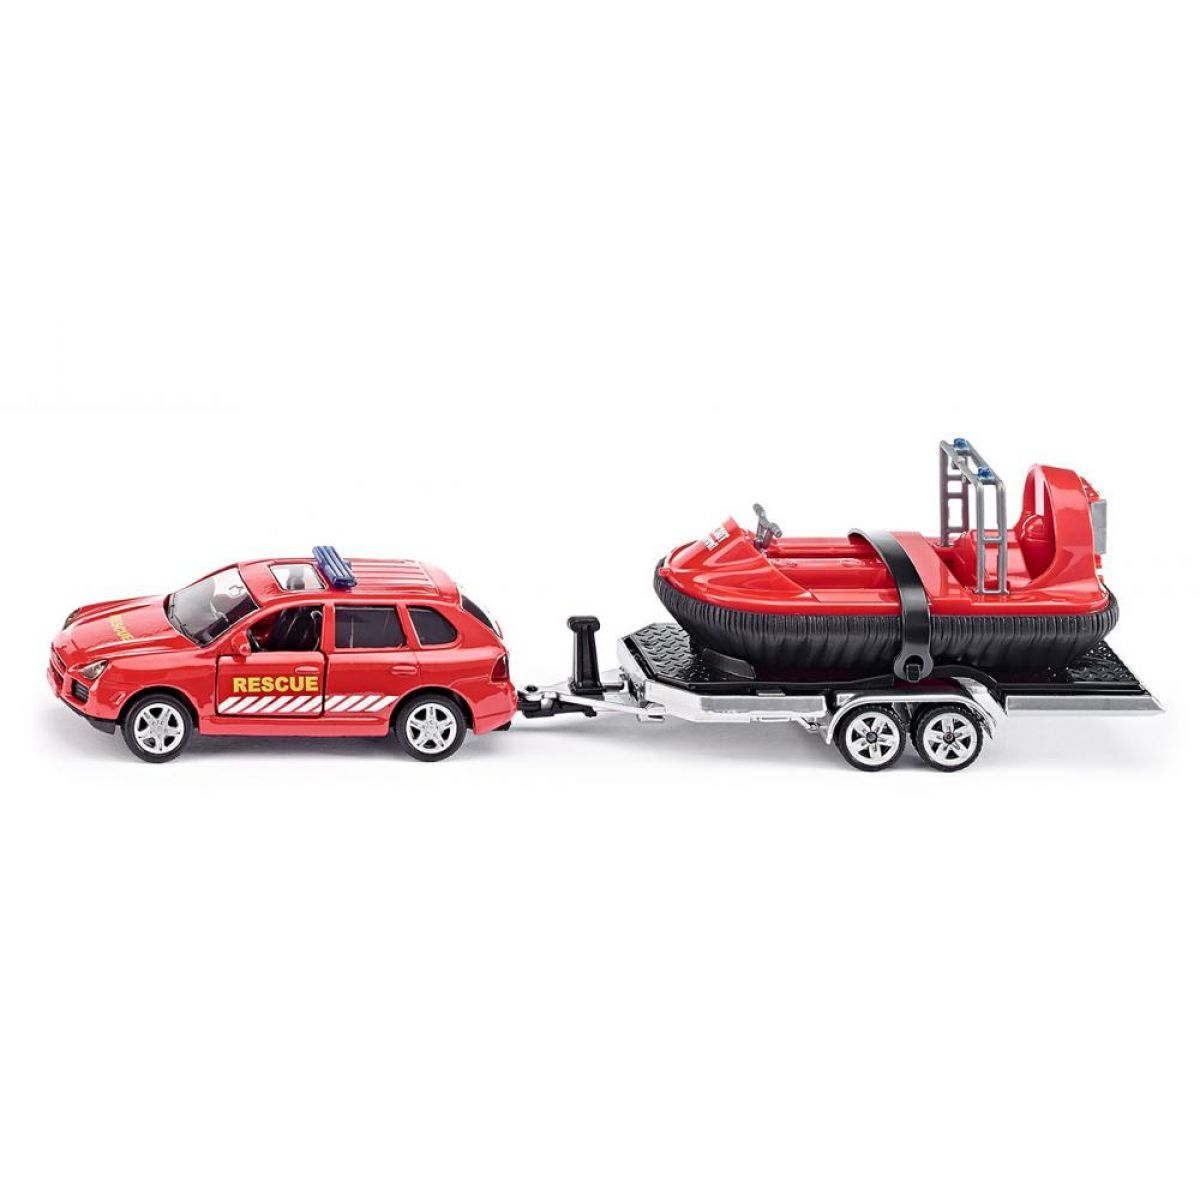 Siku Super Auto s tahačem a vodním skútrem 1:50